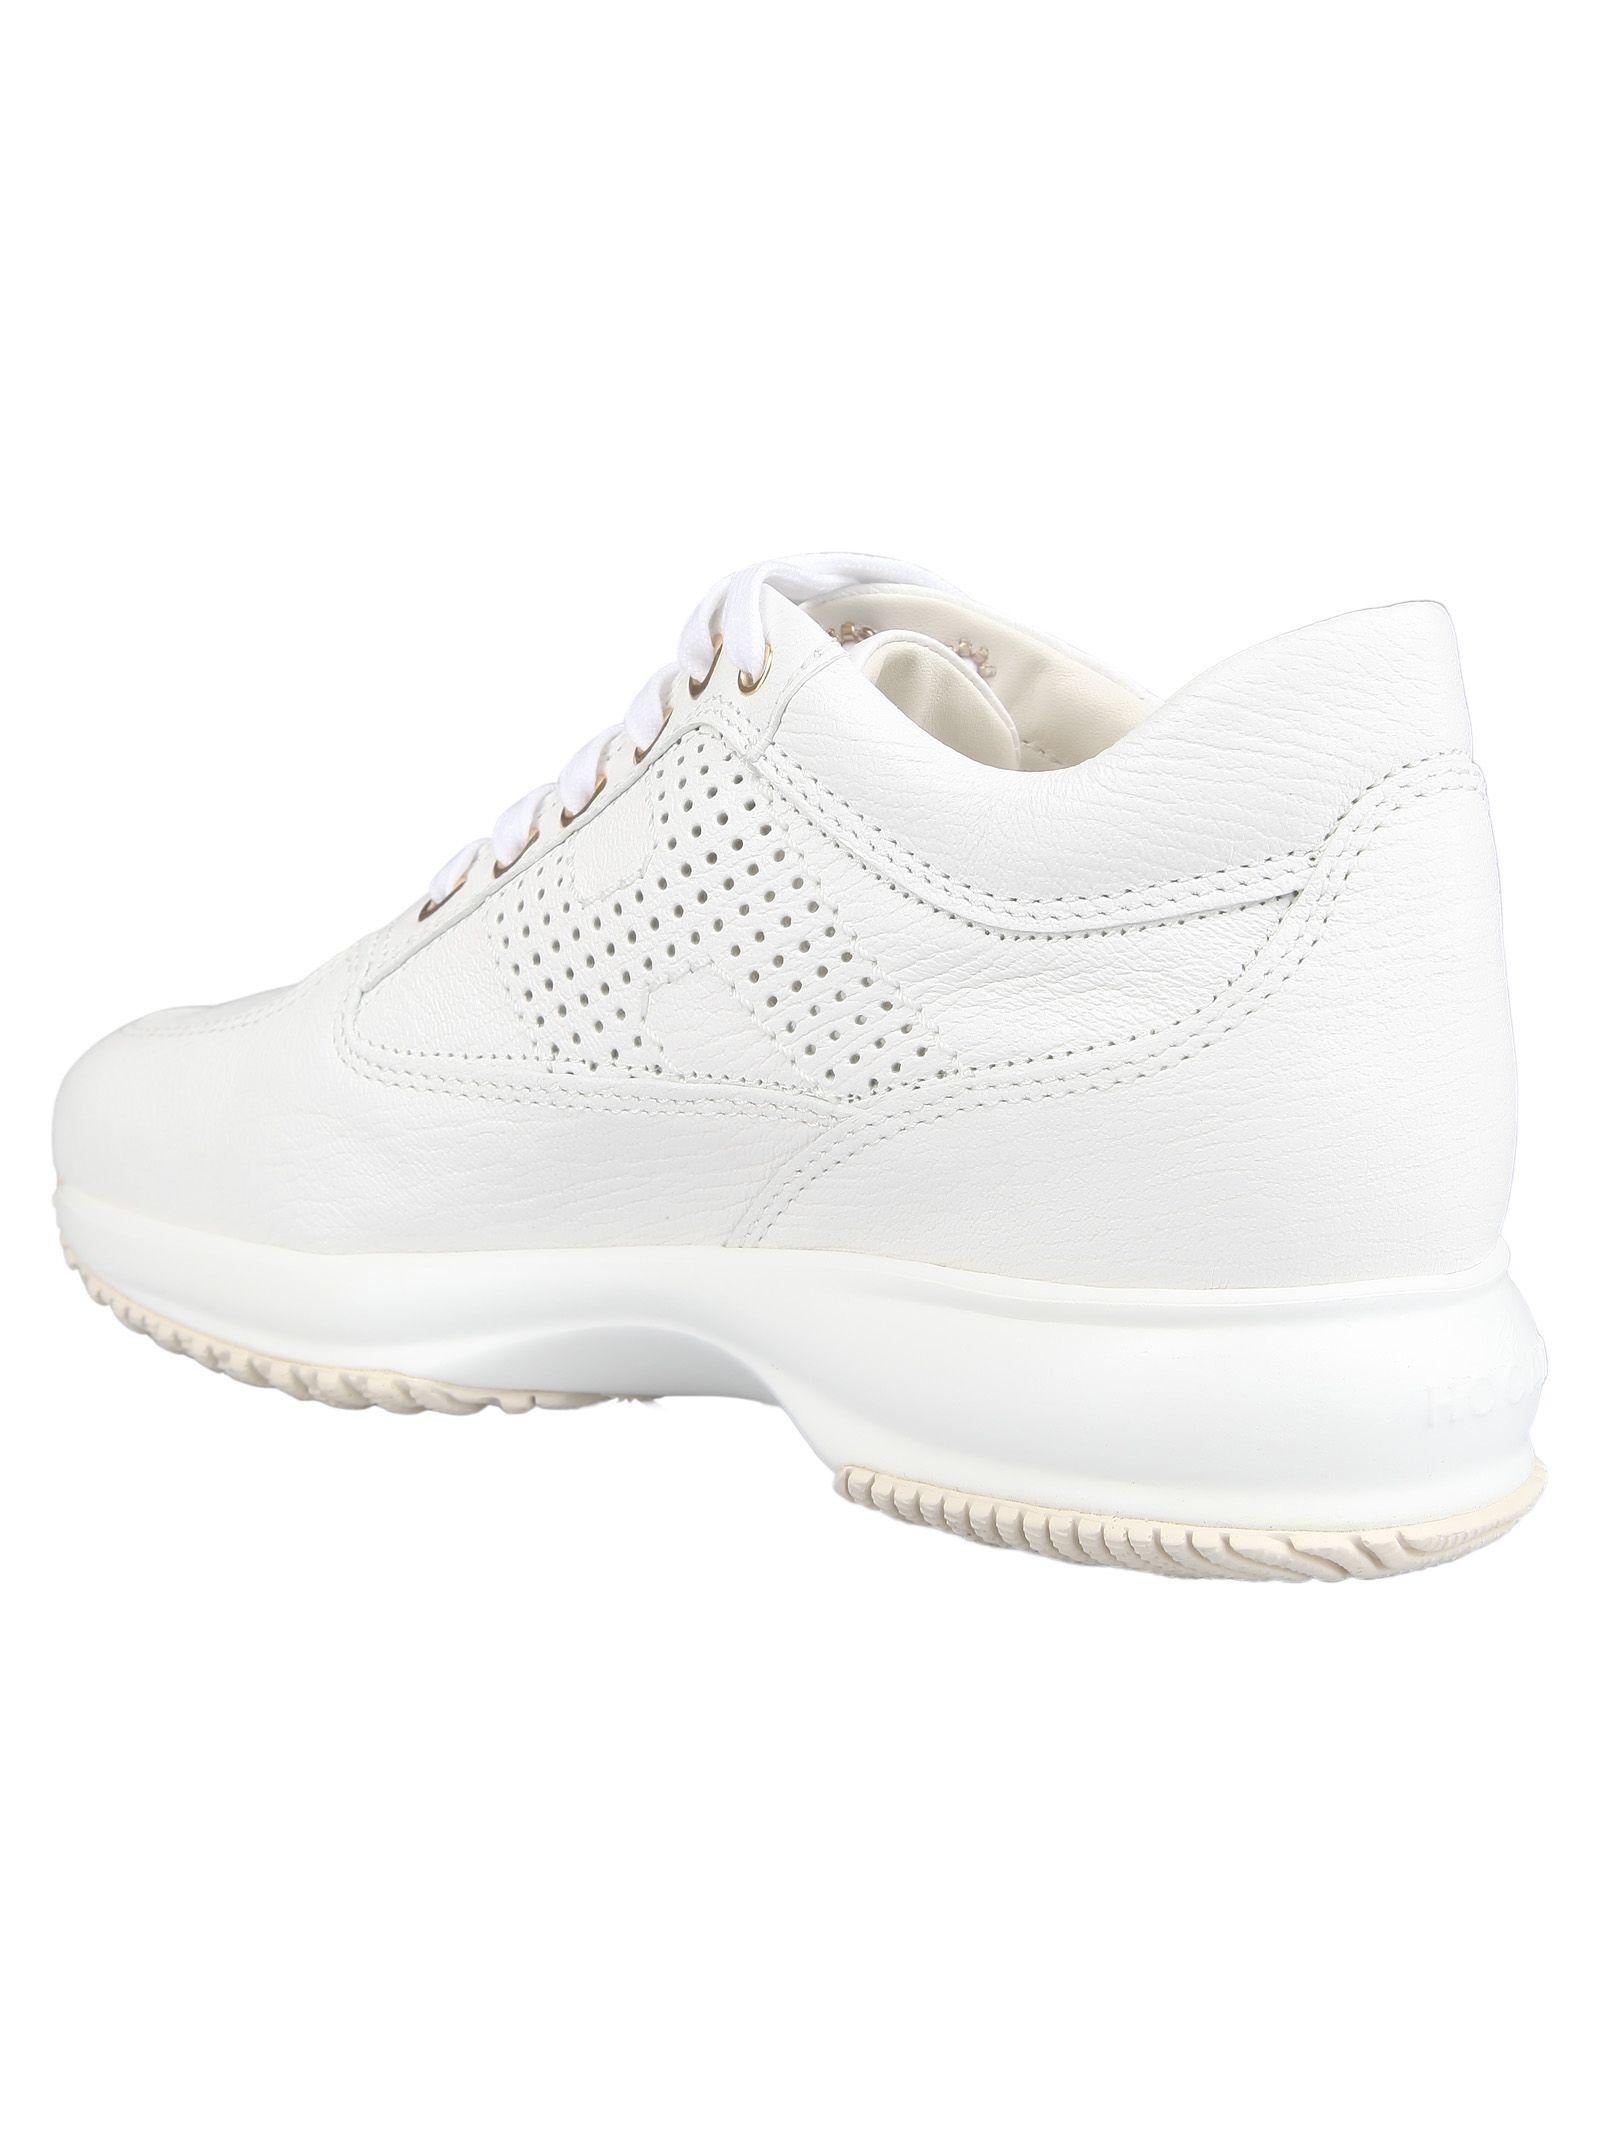 Hogan Hogan Perforated Logo Sneakers - 10789015 | italist